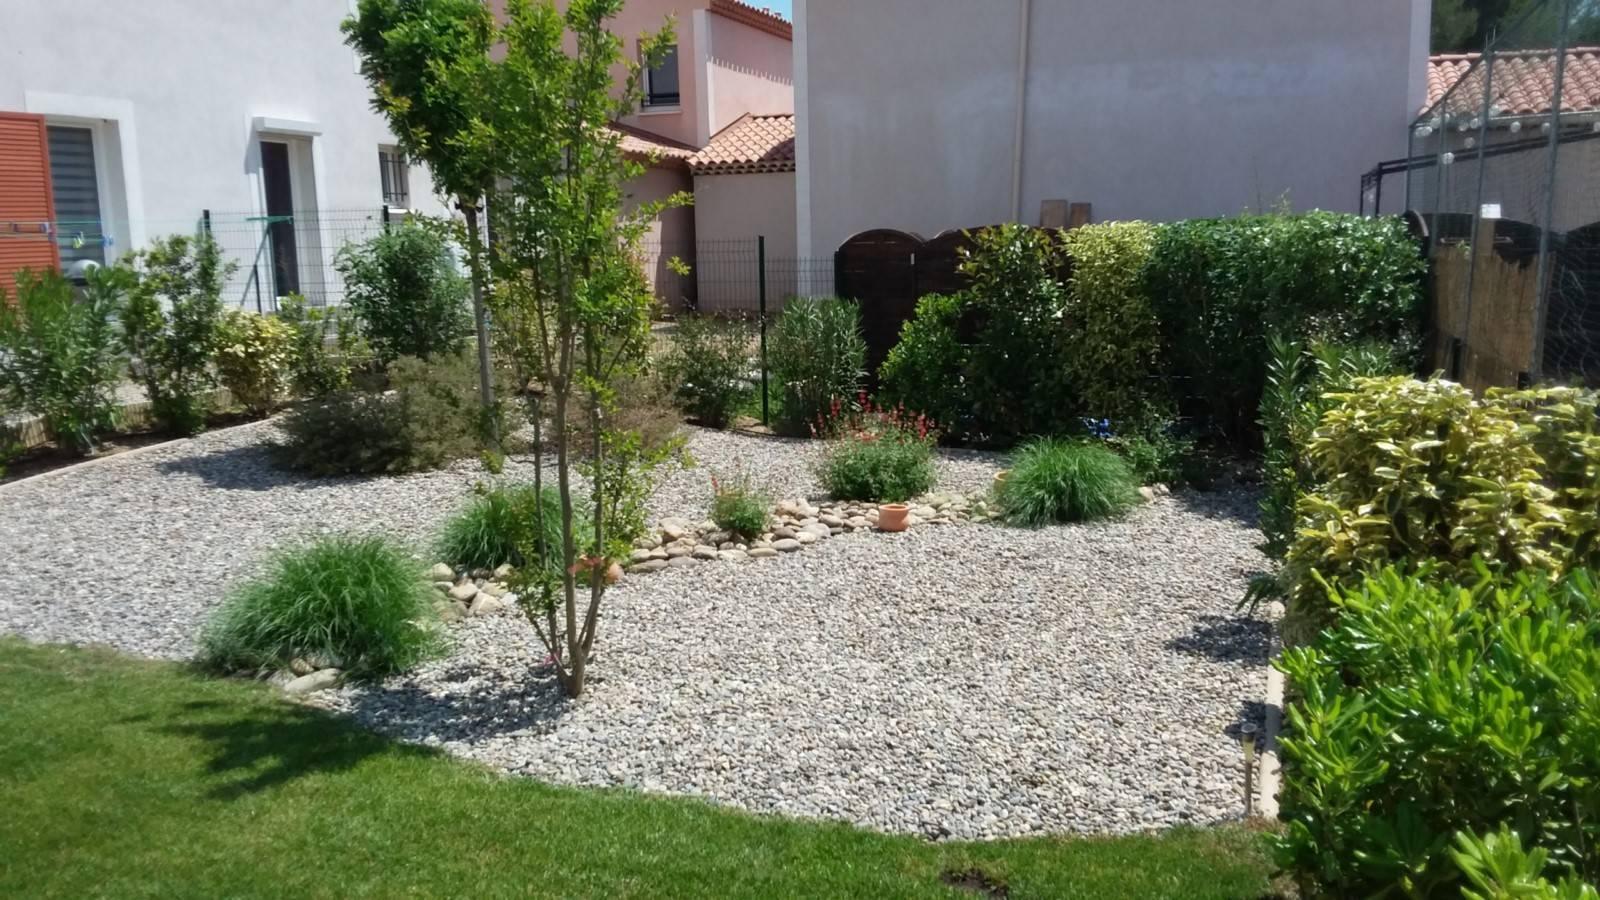 Amenagement D'un Petit Jardin Méditerranéen Devant Maison ... tout Amenagement Petit Jardin Mediterraneen